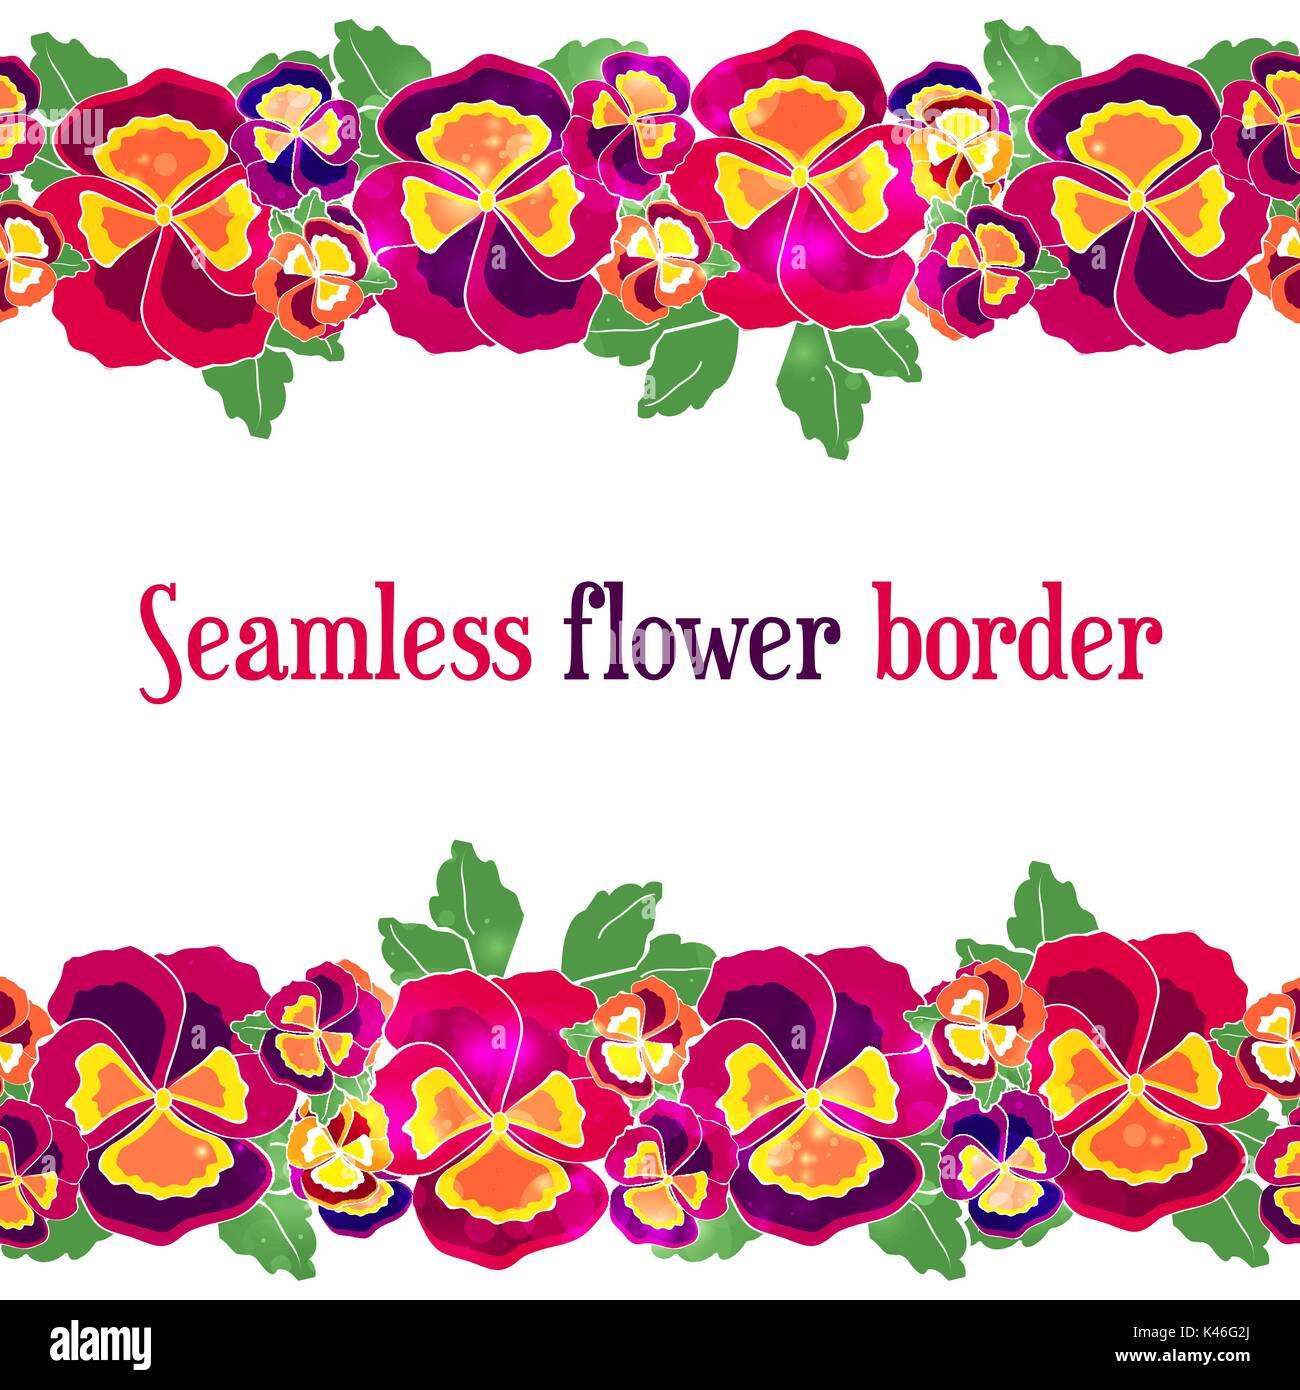 Vector Seamless Floral Border Design For Wedding Invitation Flower